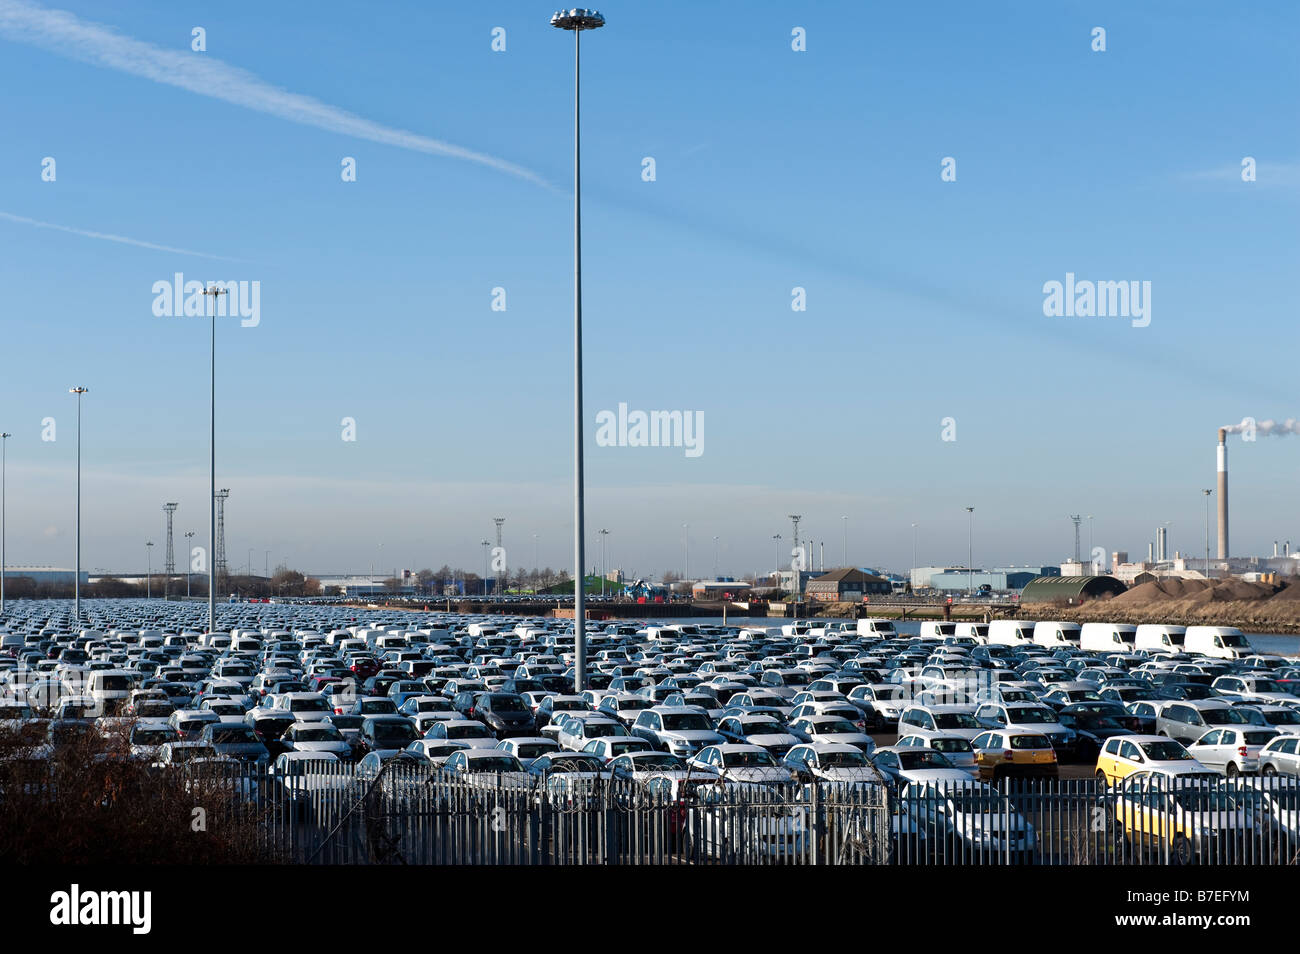 New motor vehicles awaiting exportation - Stock Image